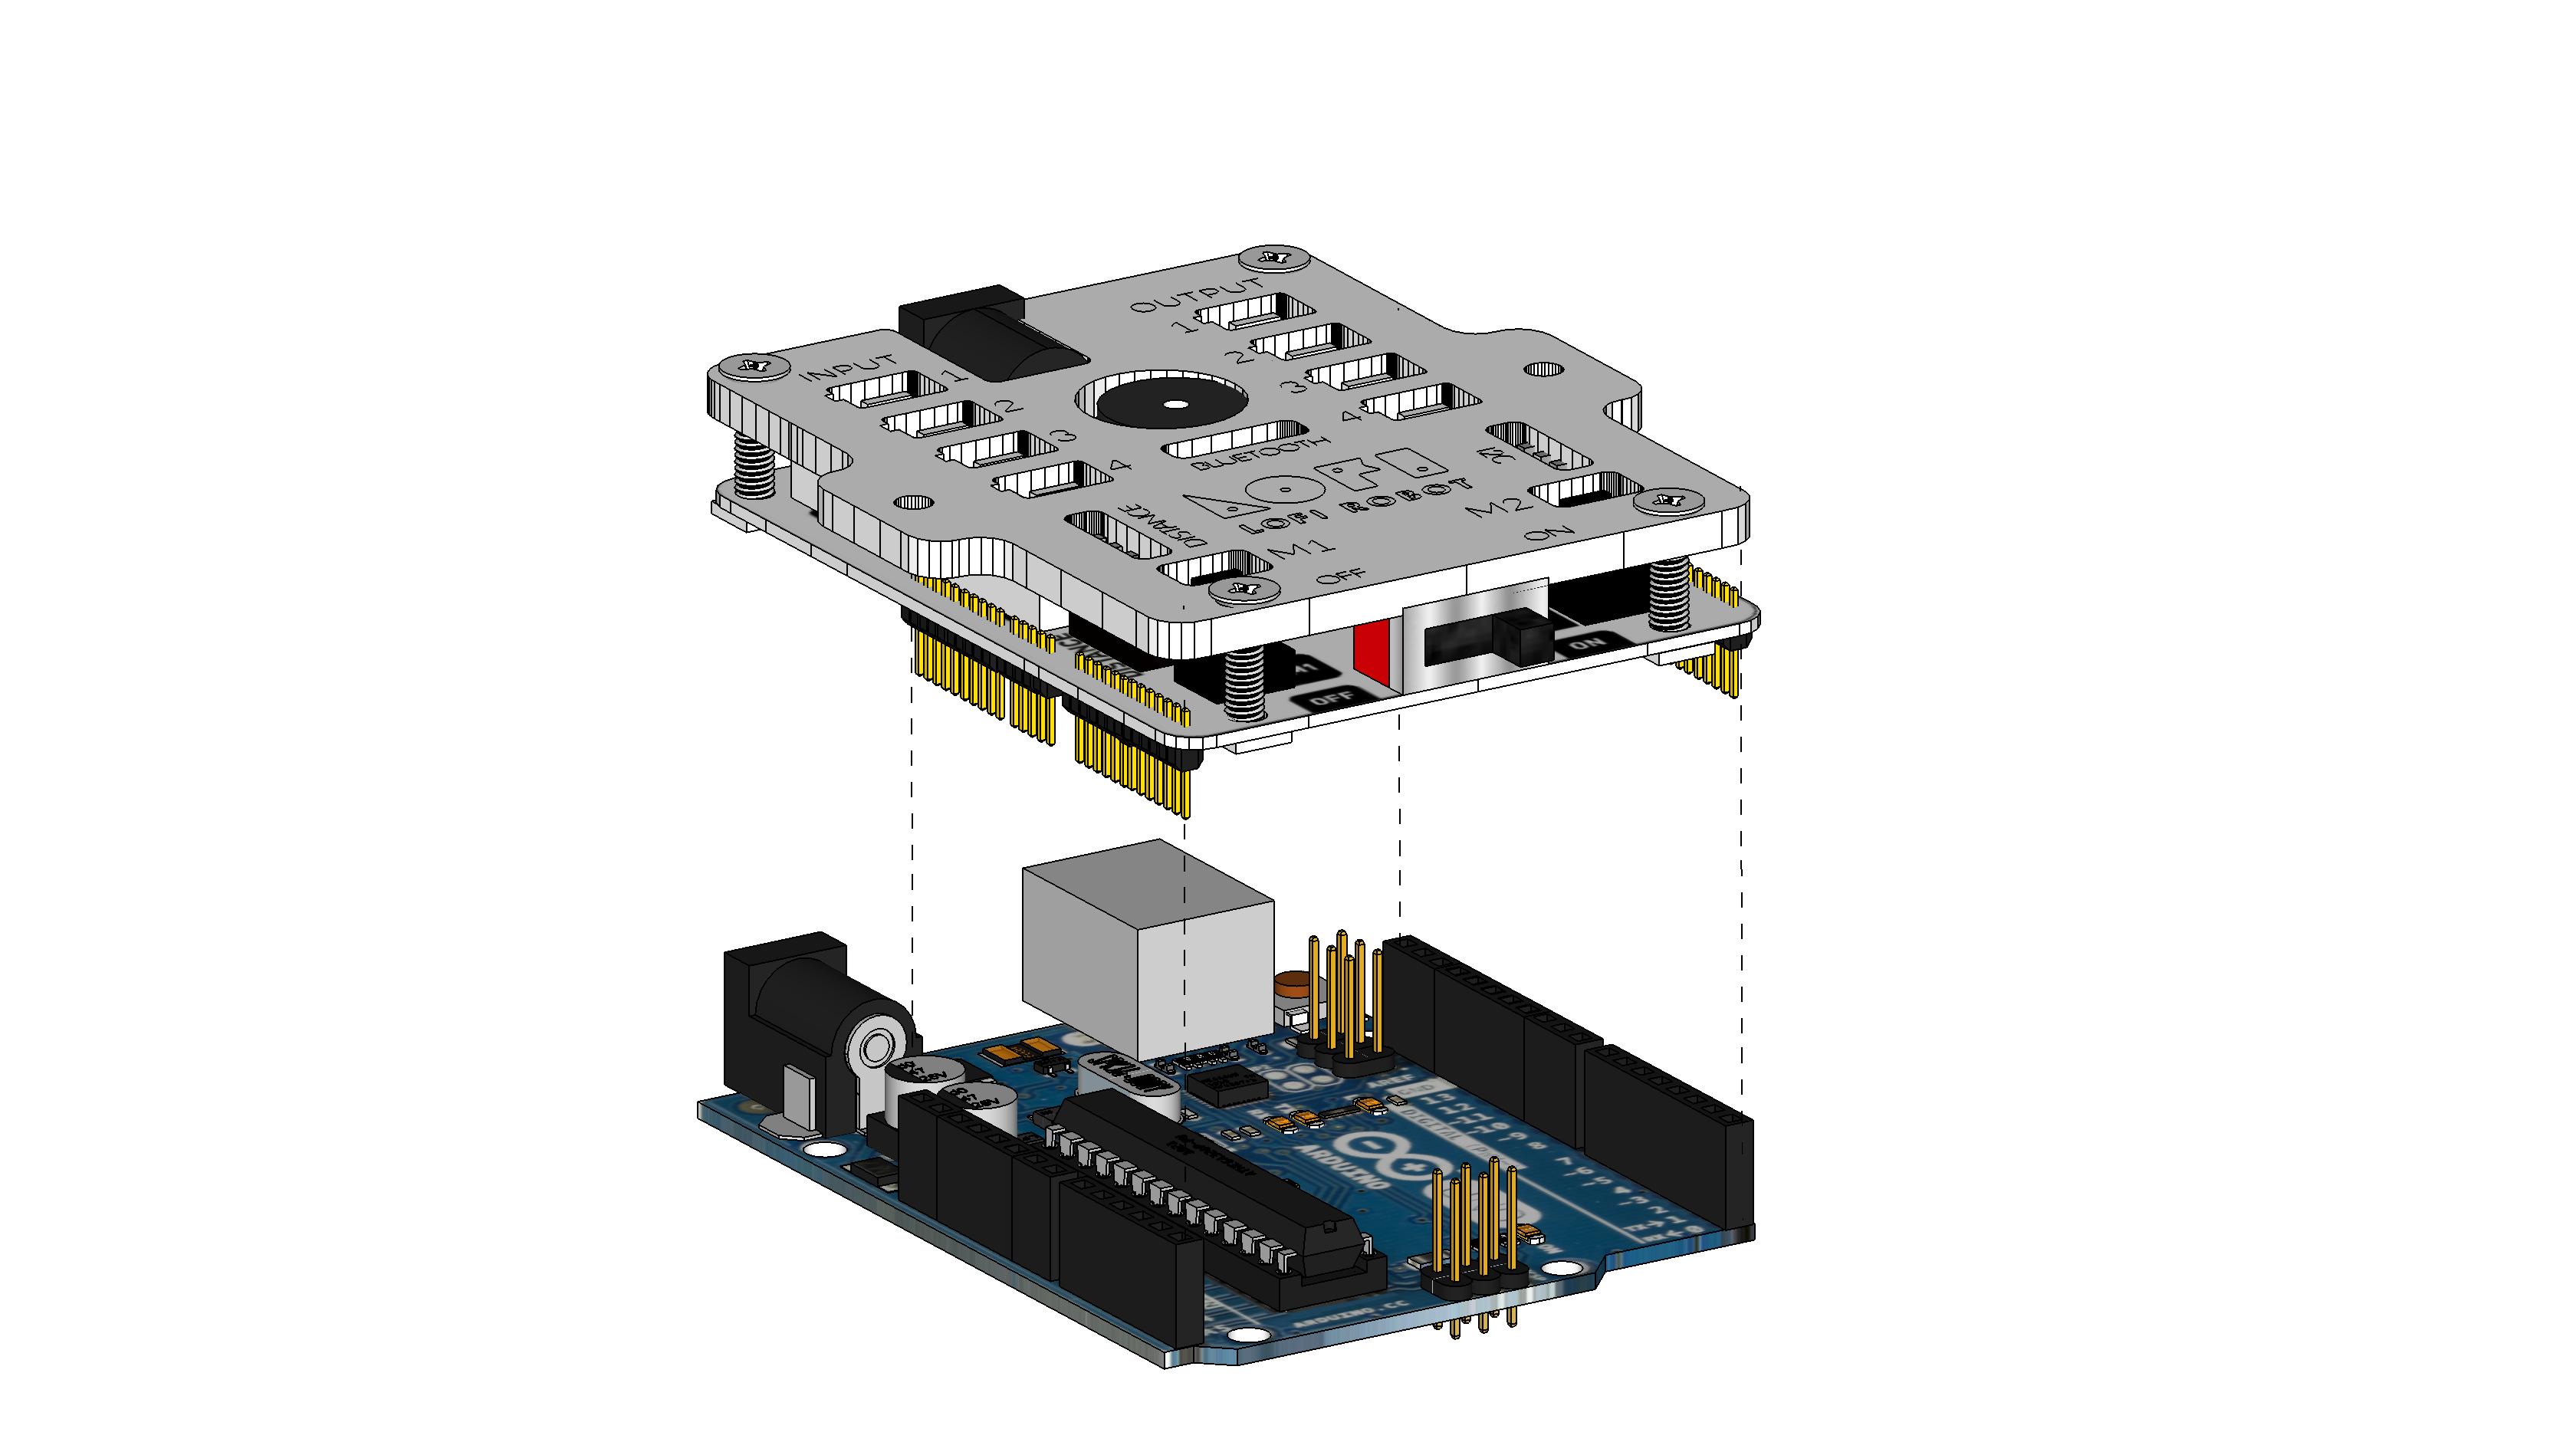 LOFI_Robot_Rover_assembly (19)